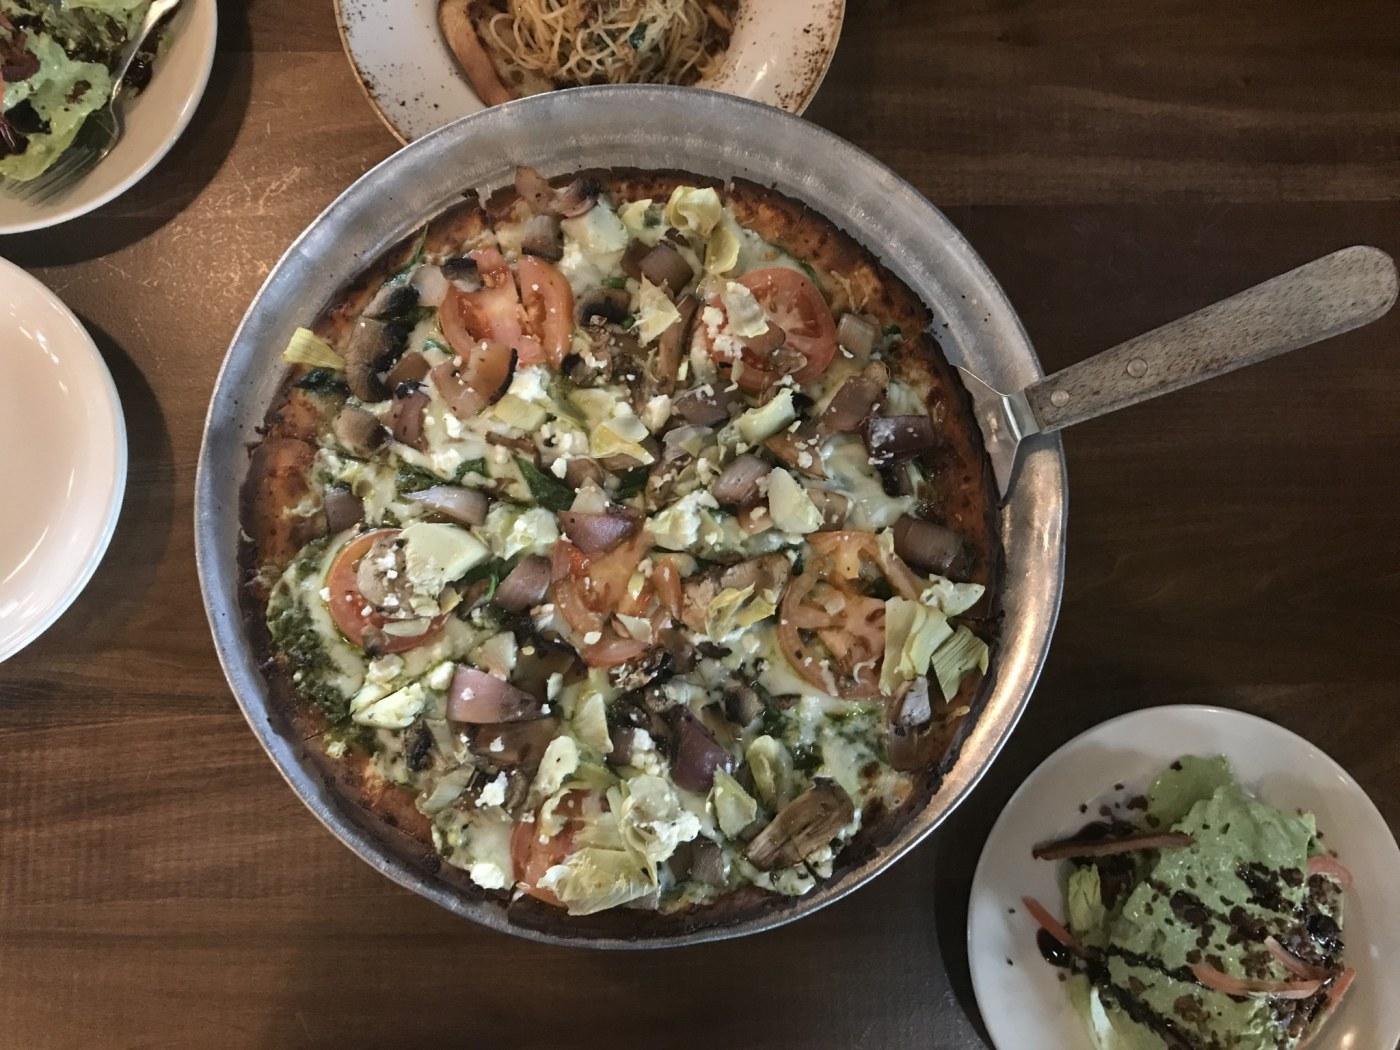 Birmingham, Vestavia, Slice Pizza, Veggie Pesto Pizza, cauliflower pizza crust, keto diet, Birmingham Eats